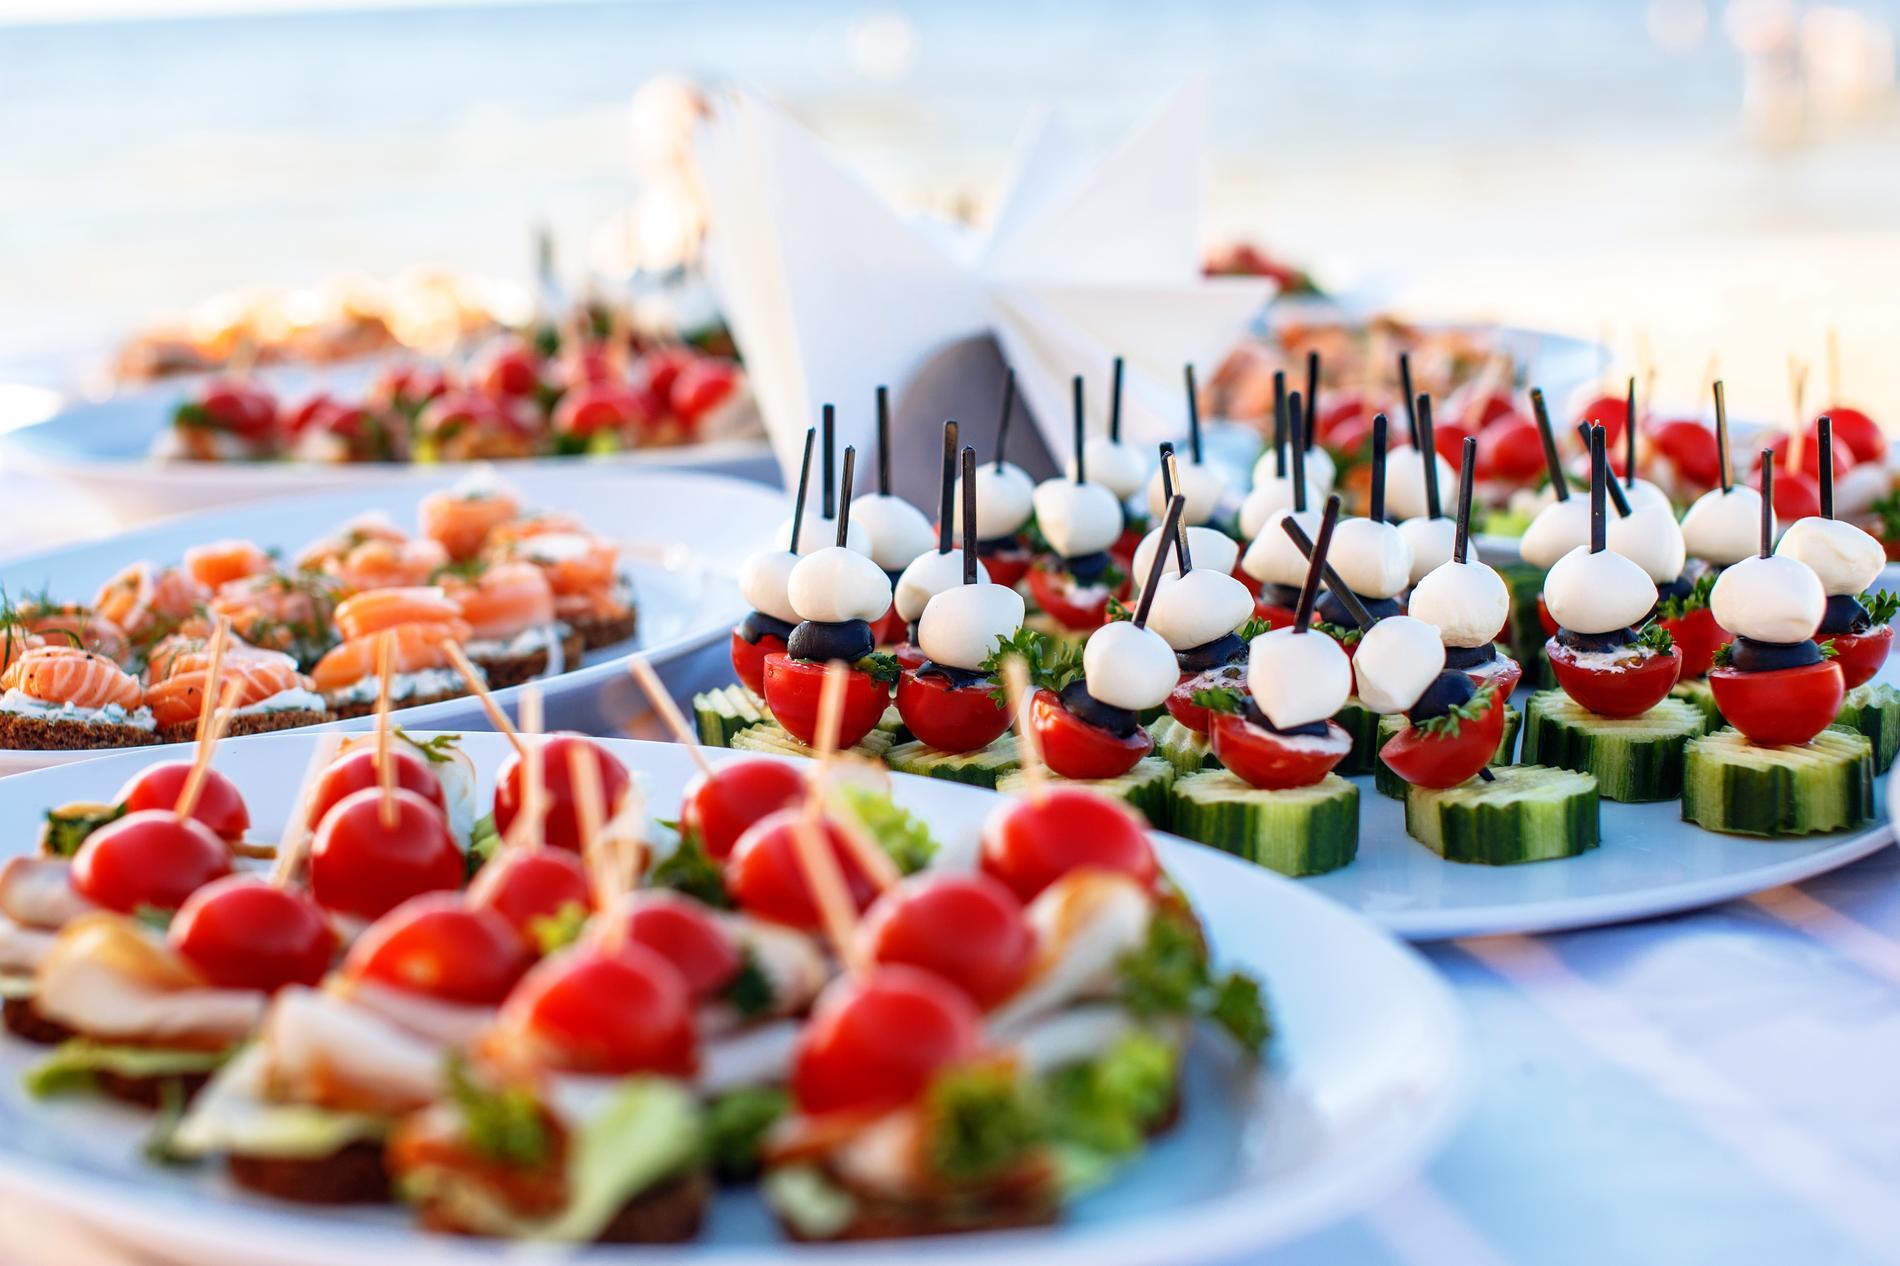 Awesome Dessert Aperitif Dinatoire Recettes Faciles Et Rapides Cuisine Home Interior And Landscaping Ologienasavecom